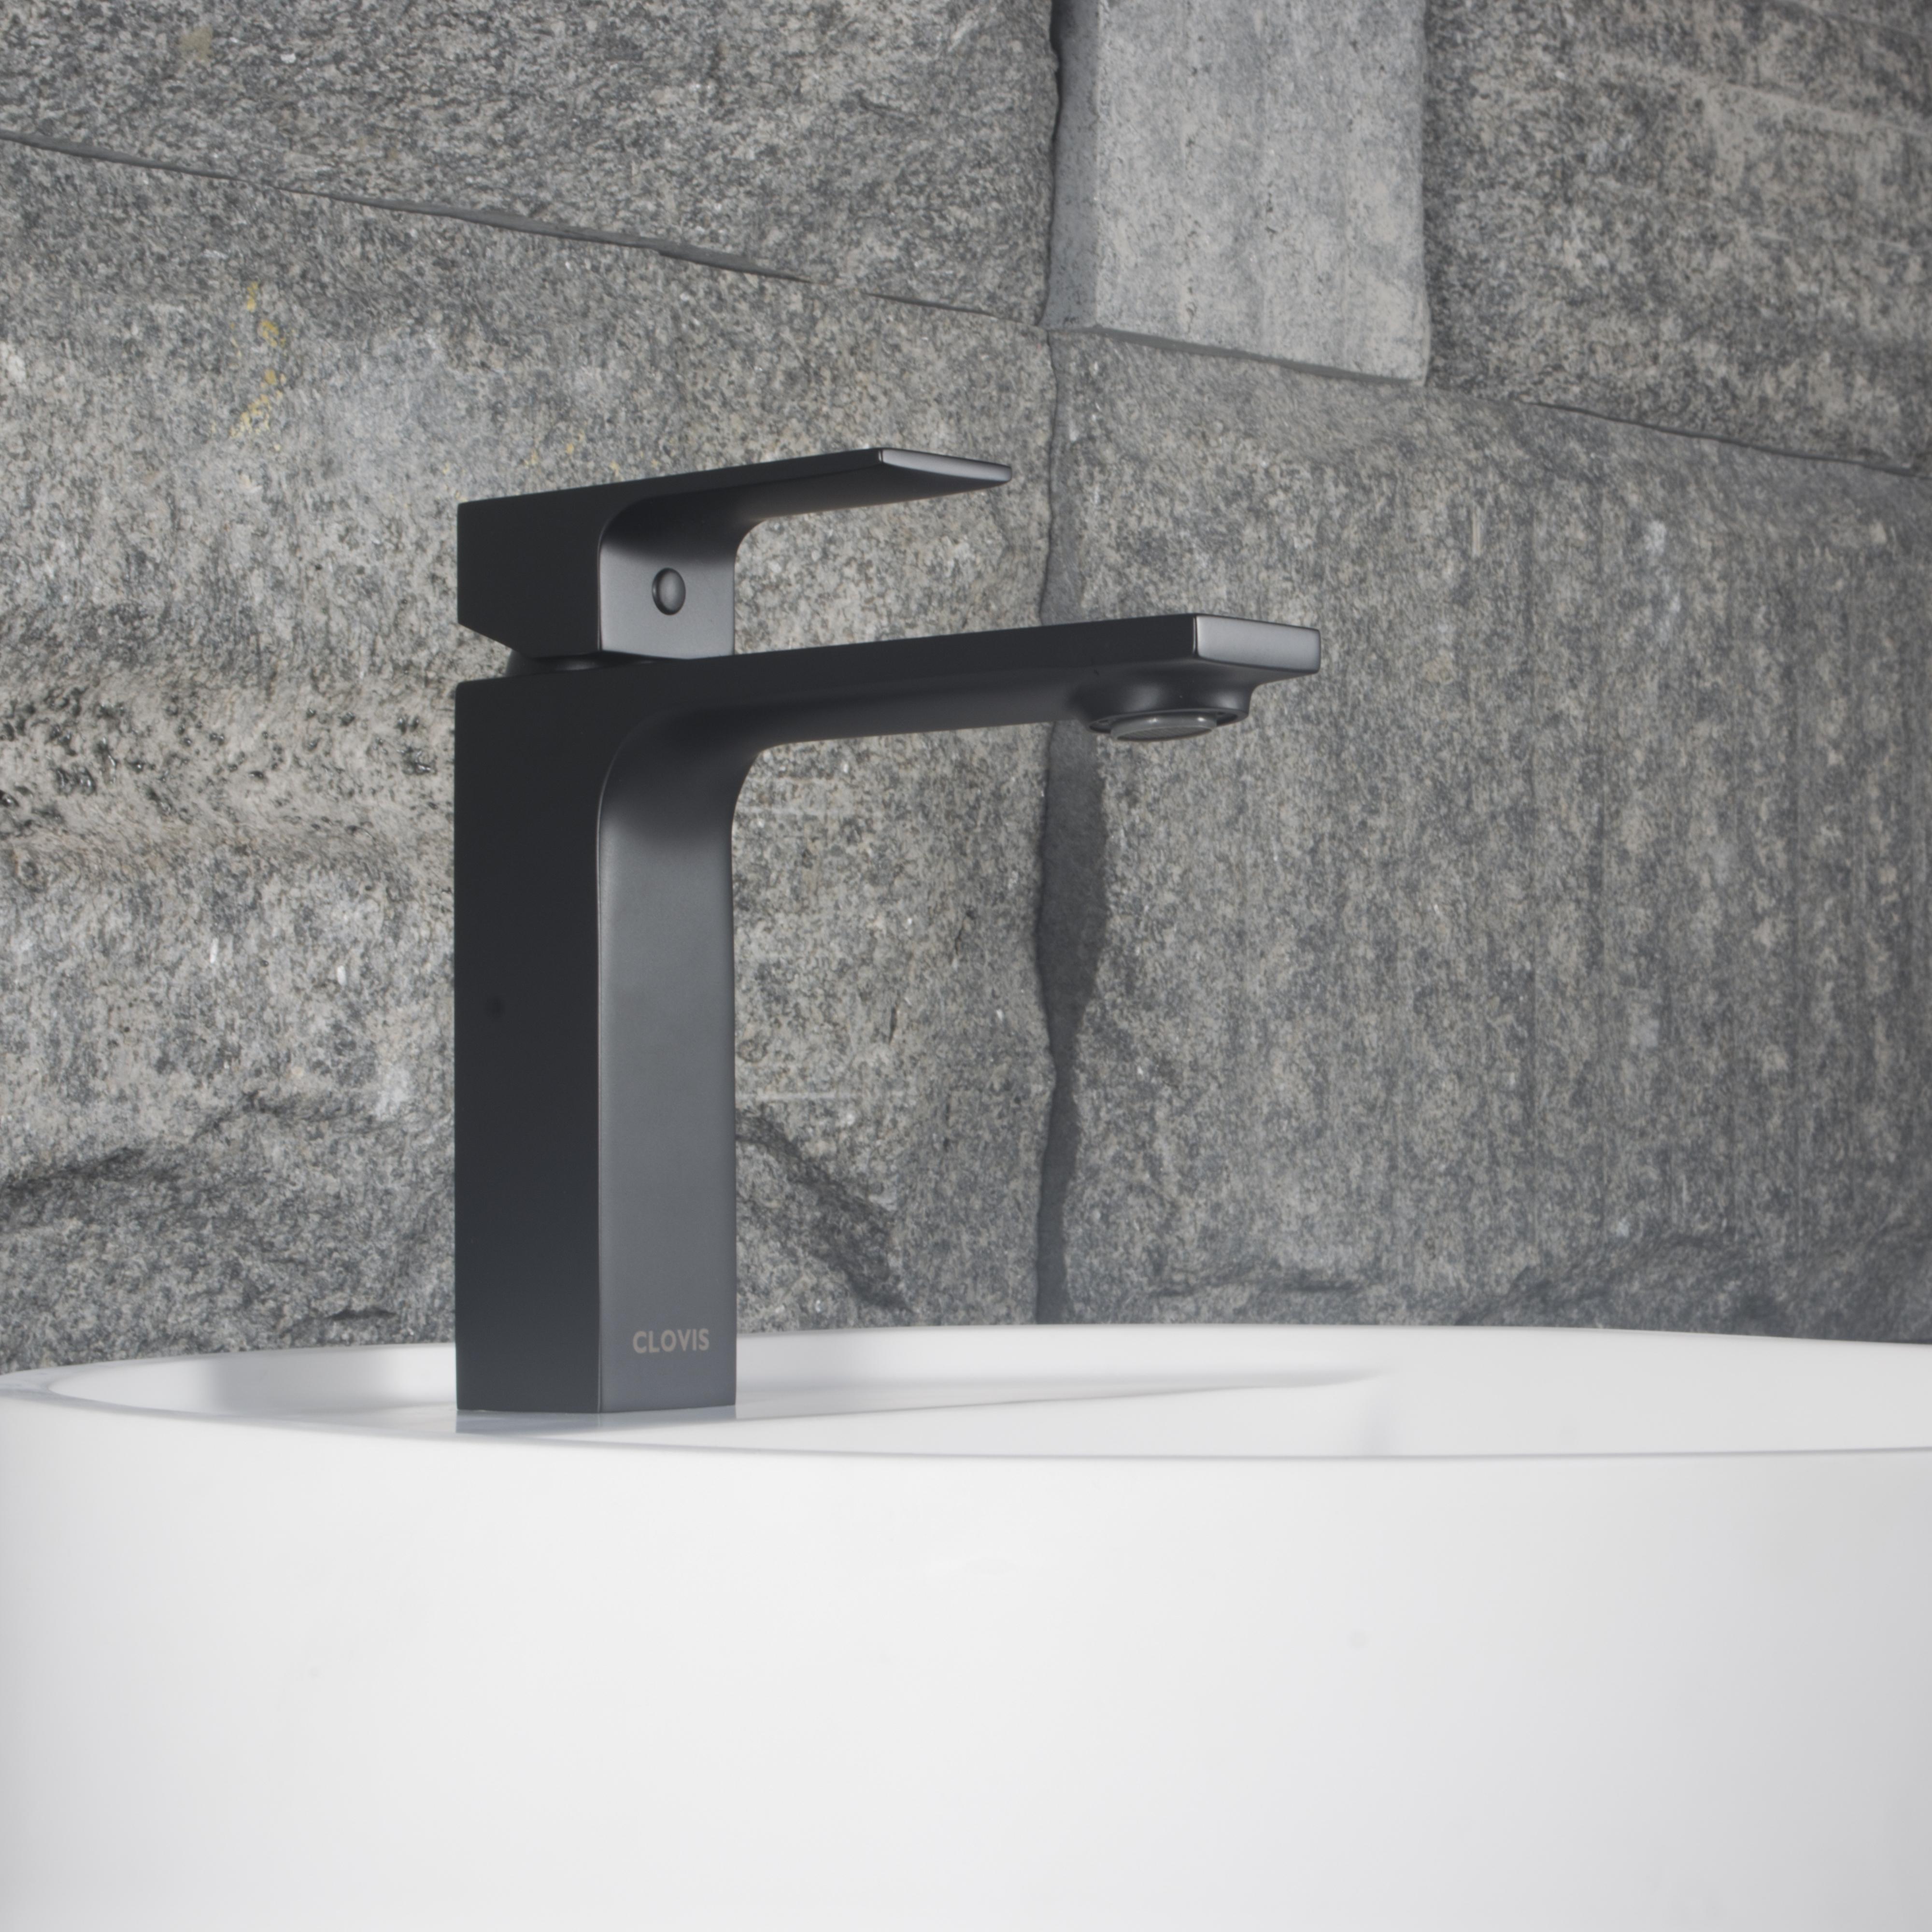 [US Direct] Single handle lavatory faucet with pop up drain, chrome